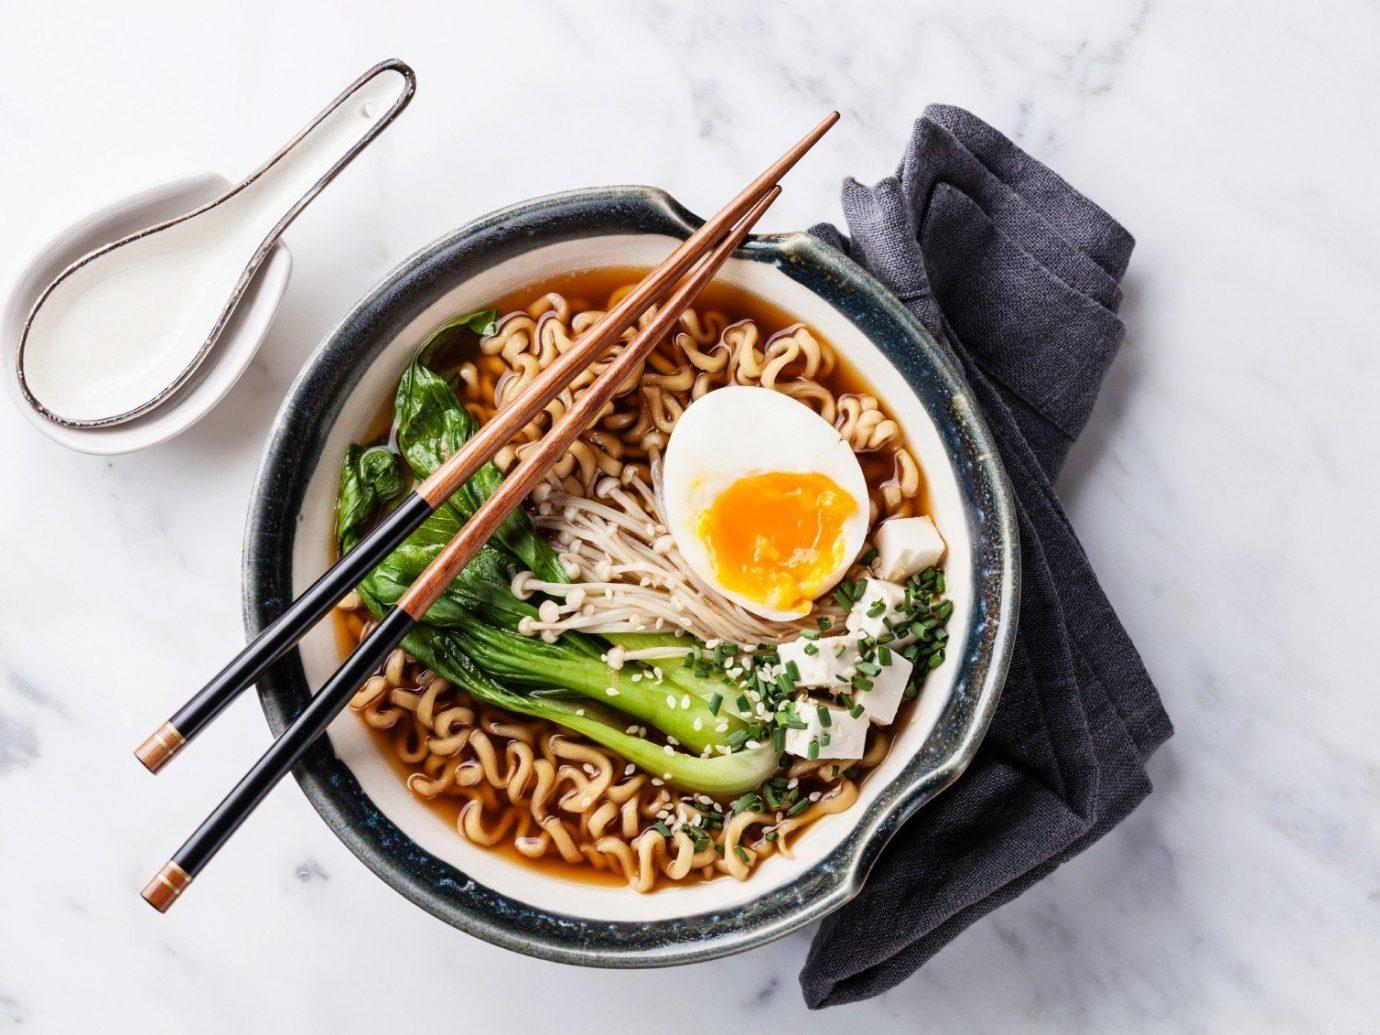 Food + Drink dish food cuisine meal produce asian food vegetable